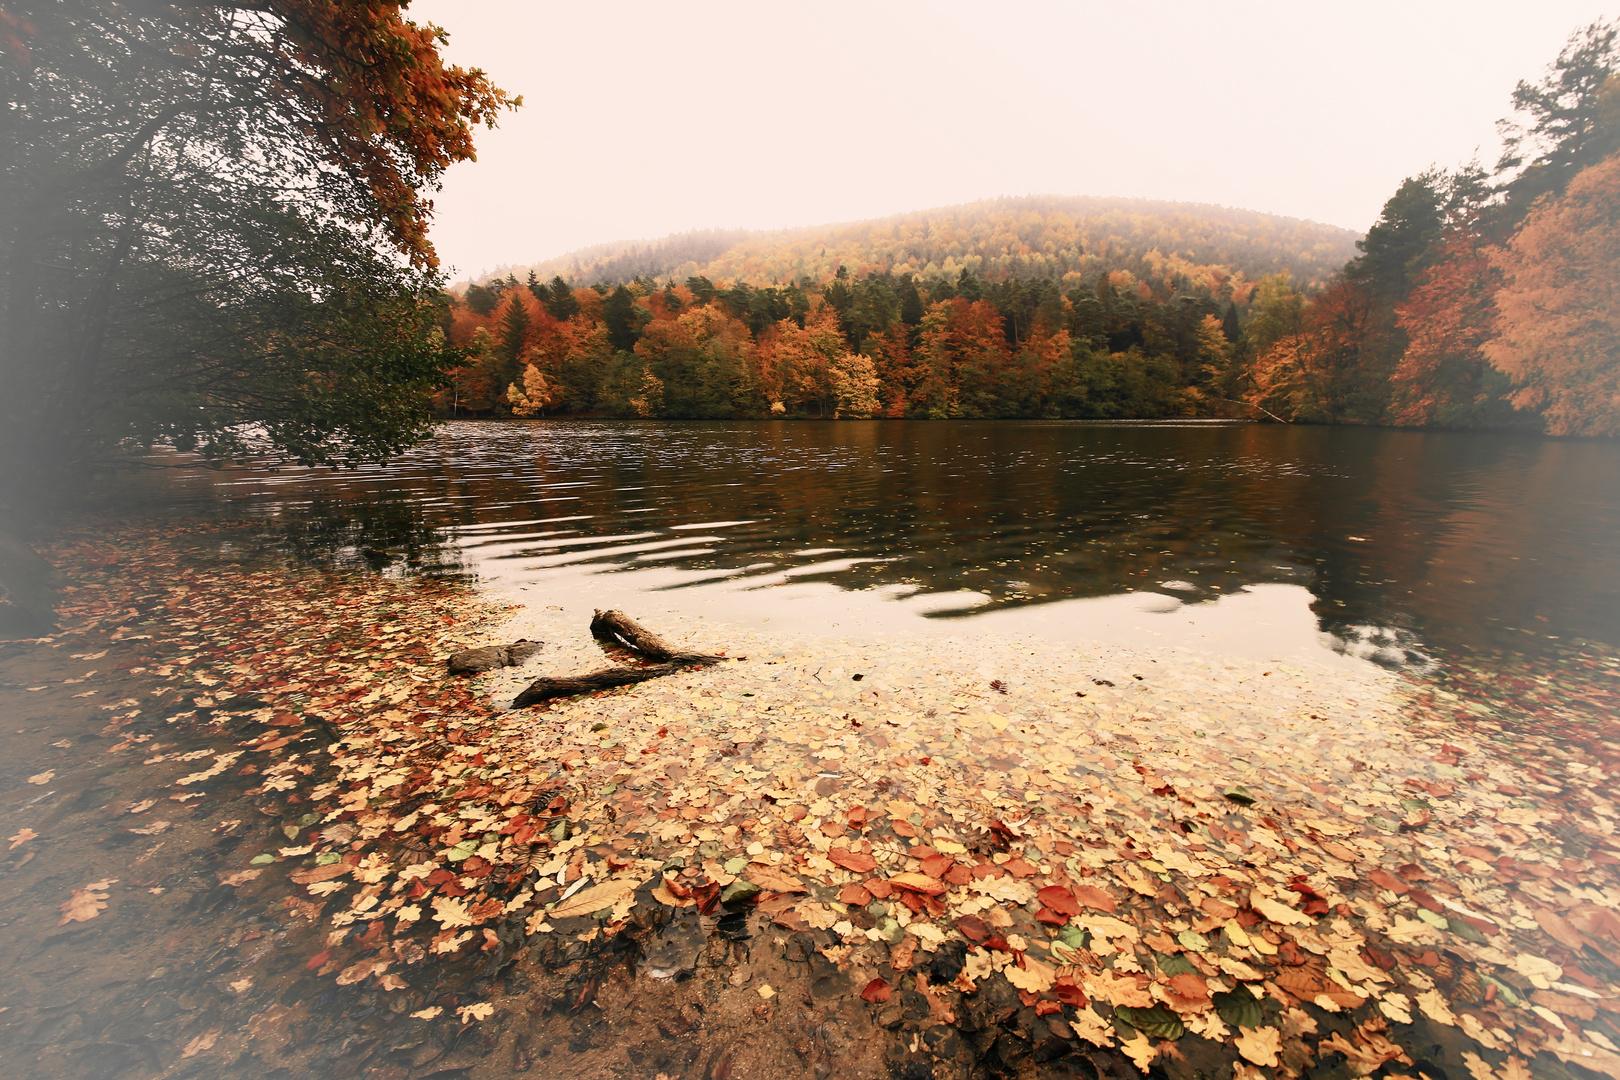 Herbst Total am Seehof Krs. Südwestpfalz am 26.10.2015